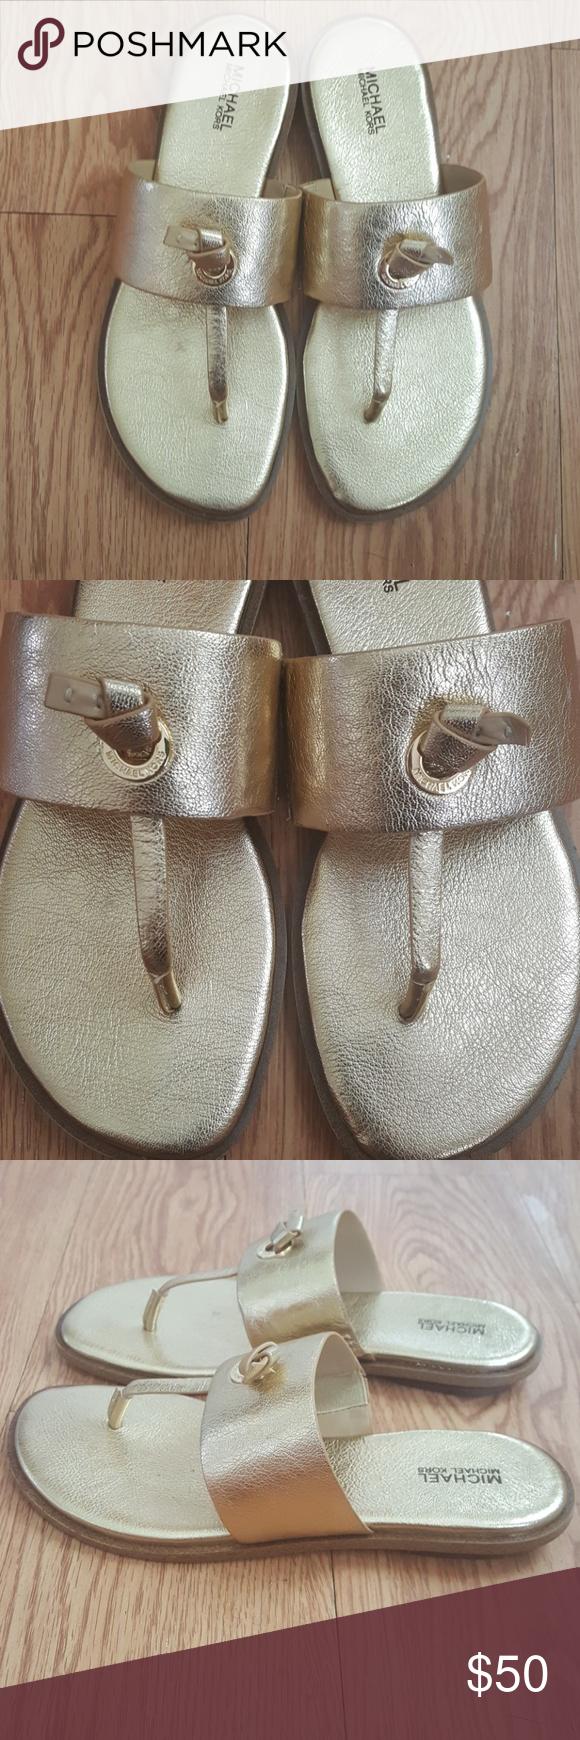 5258cc347d3 Michael Kors Cindy Sandal Metallic Leather Size 7M New with the box Michael  Kors Cindy Sandal Color  Gold Metallic 1